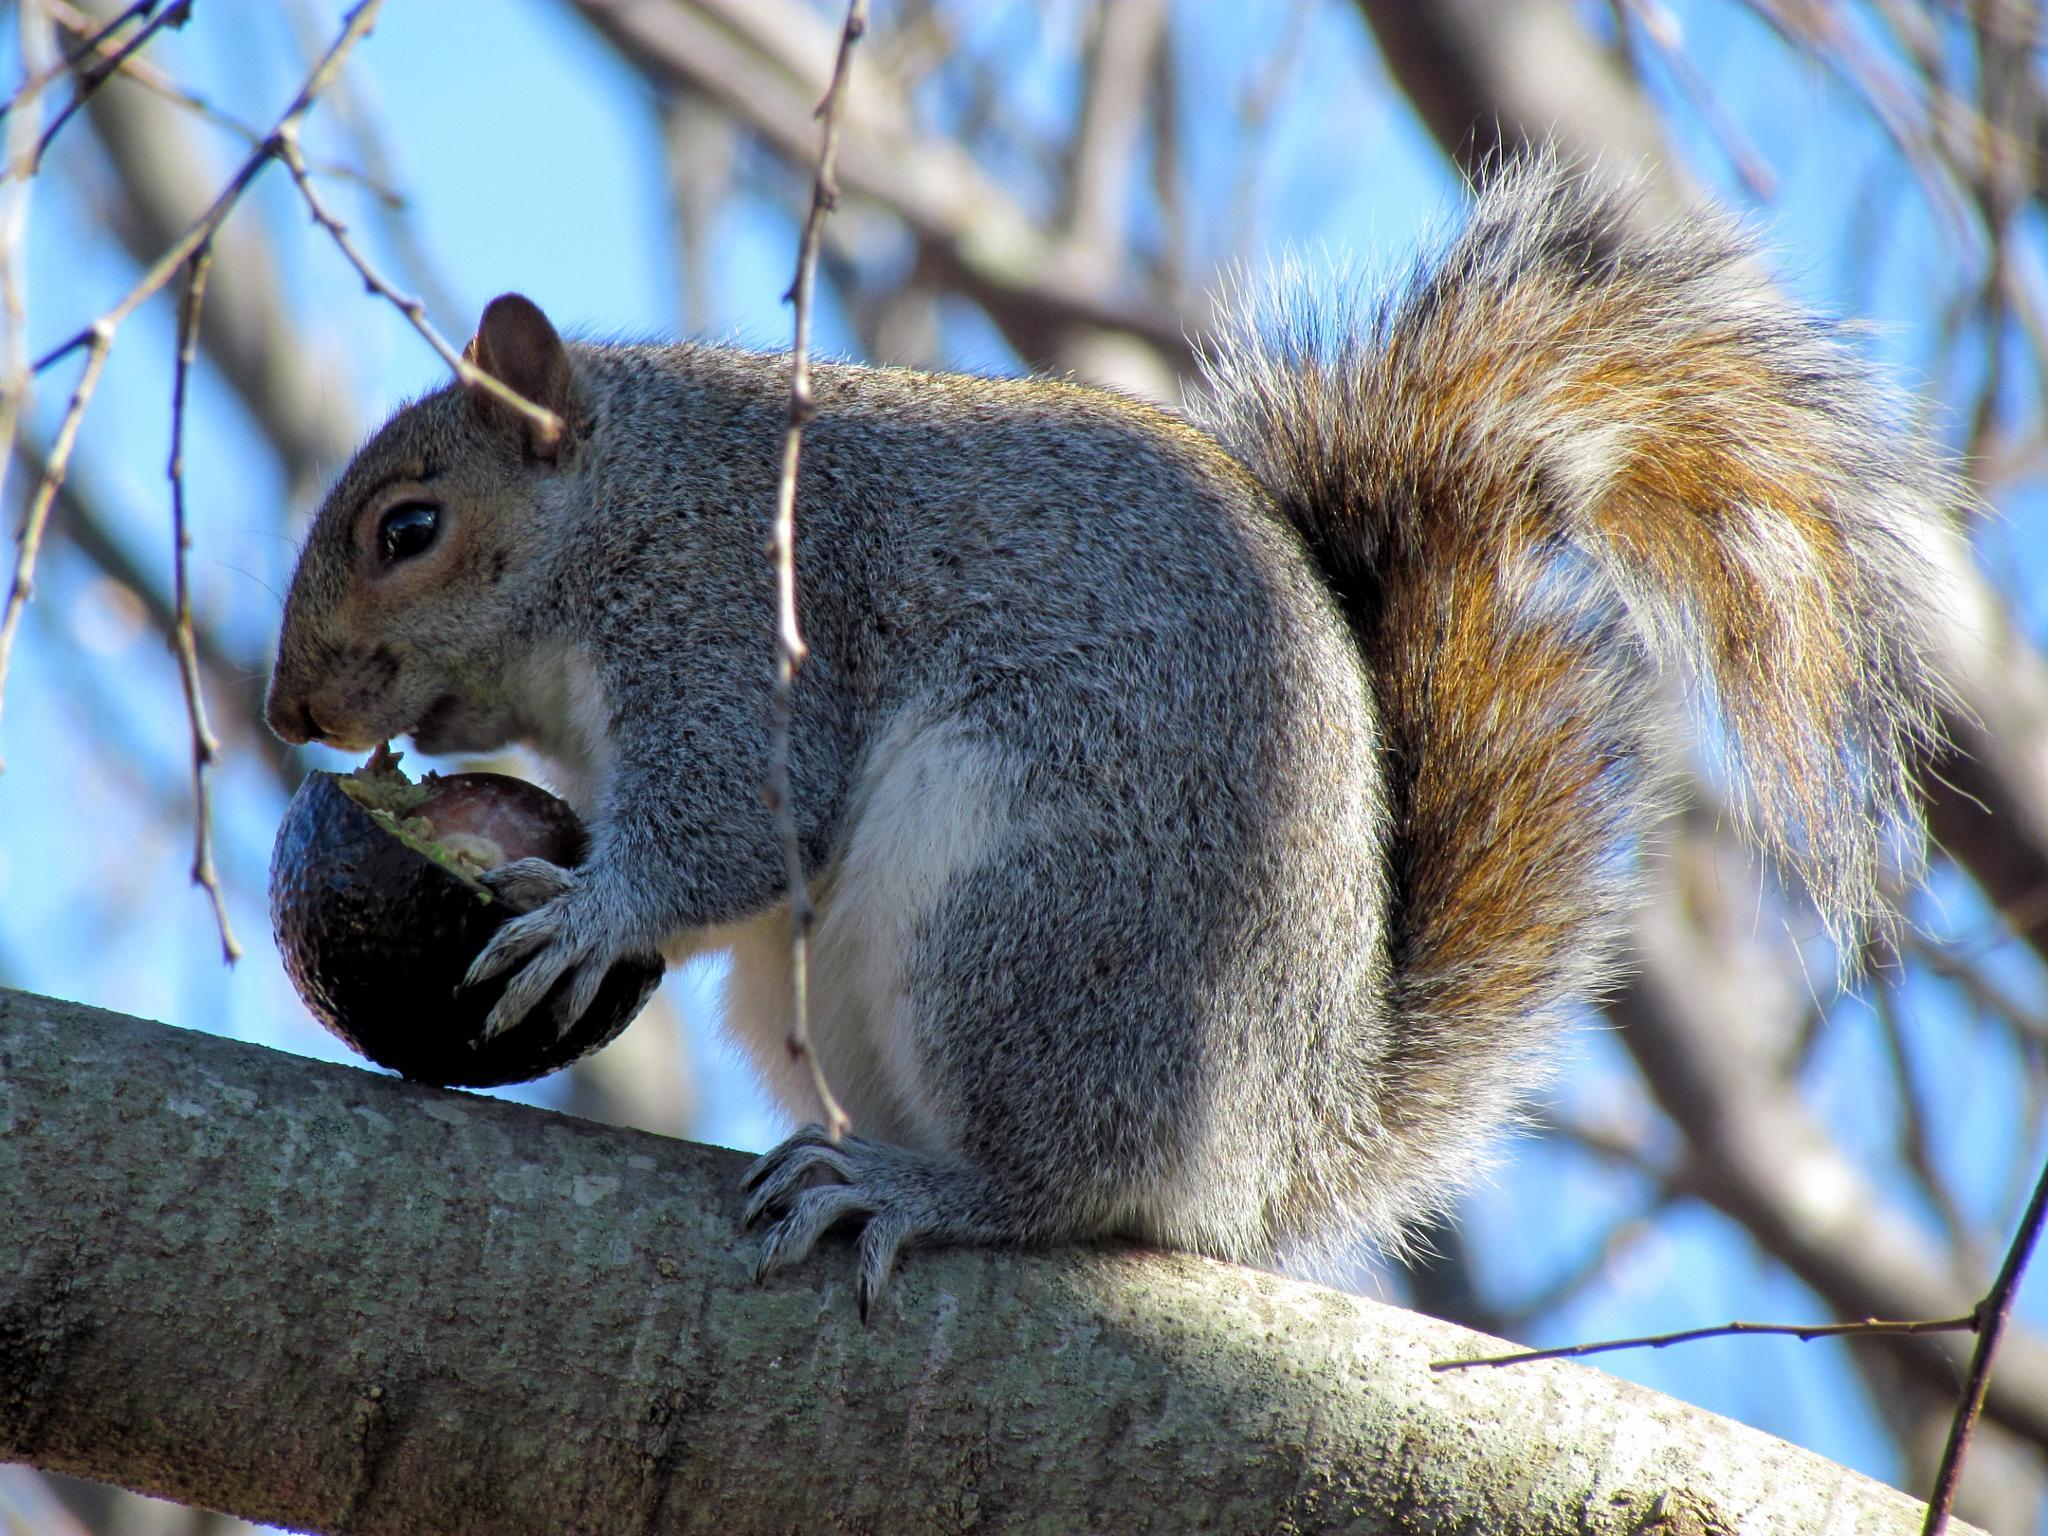 Squirrel 1 by Charmaigne Logie